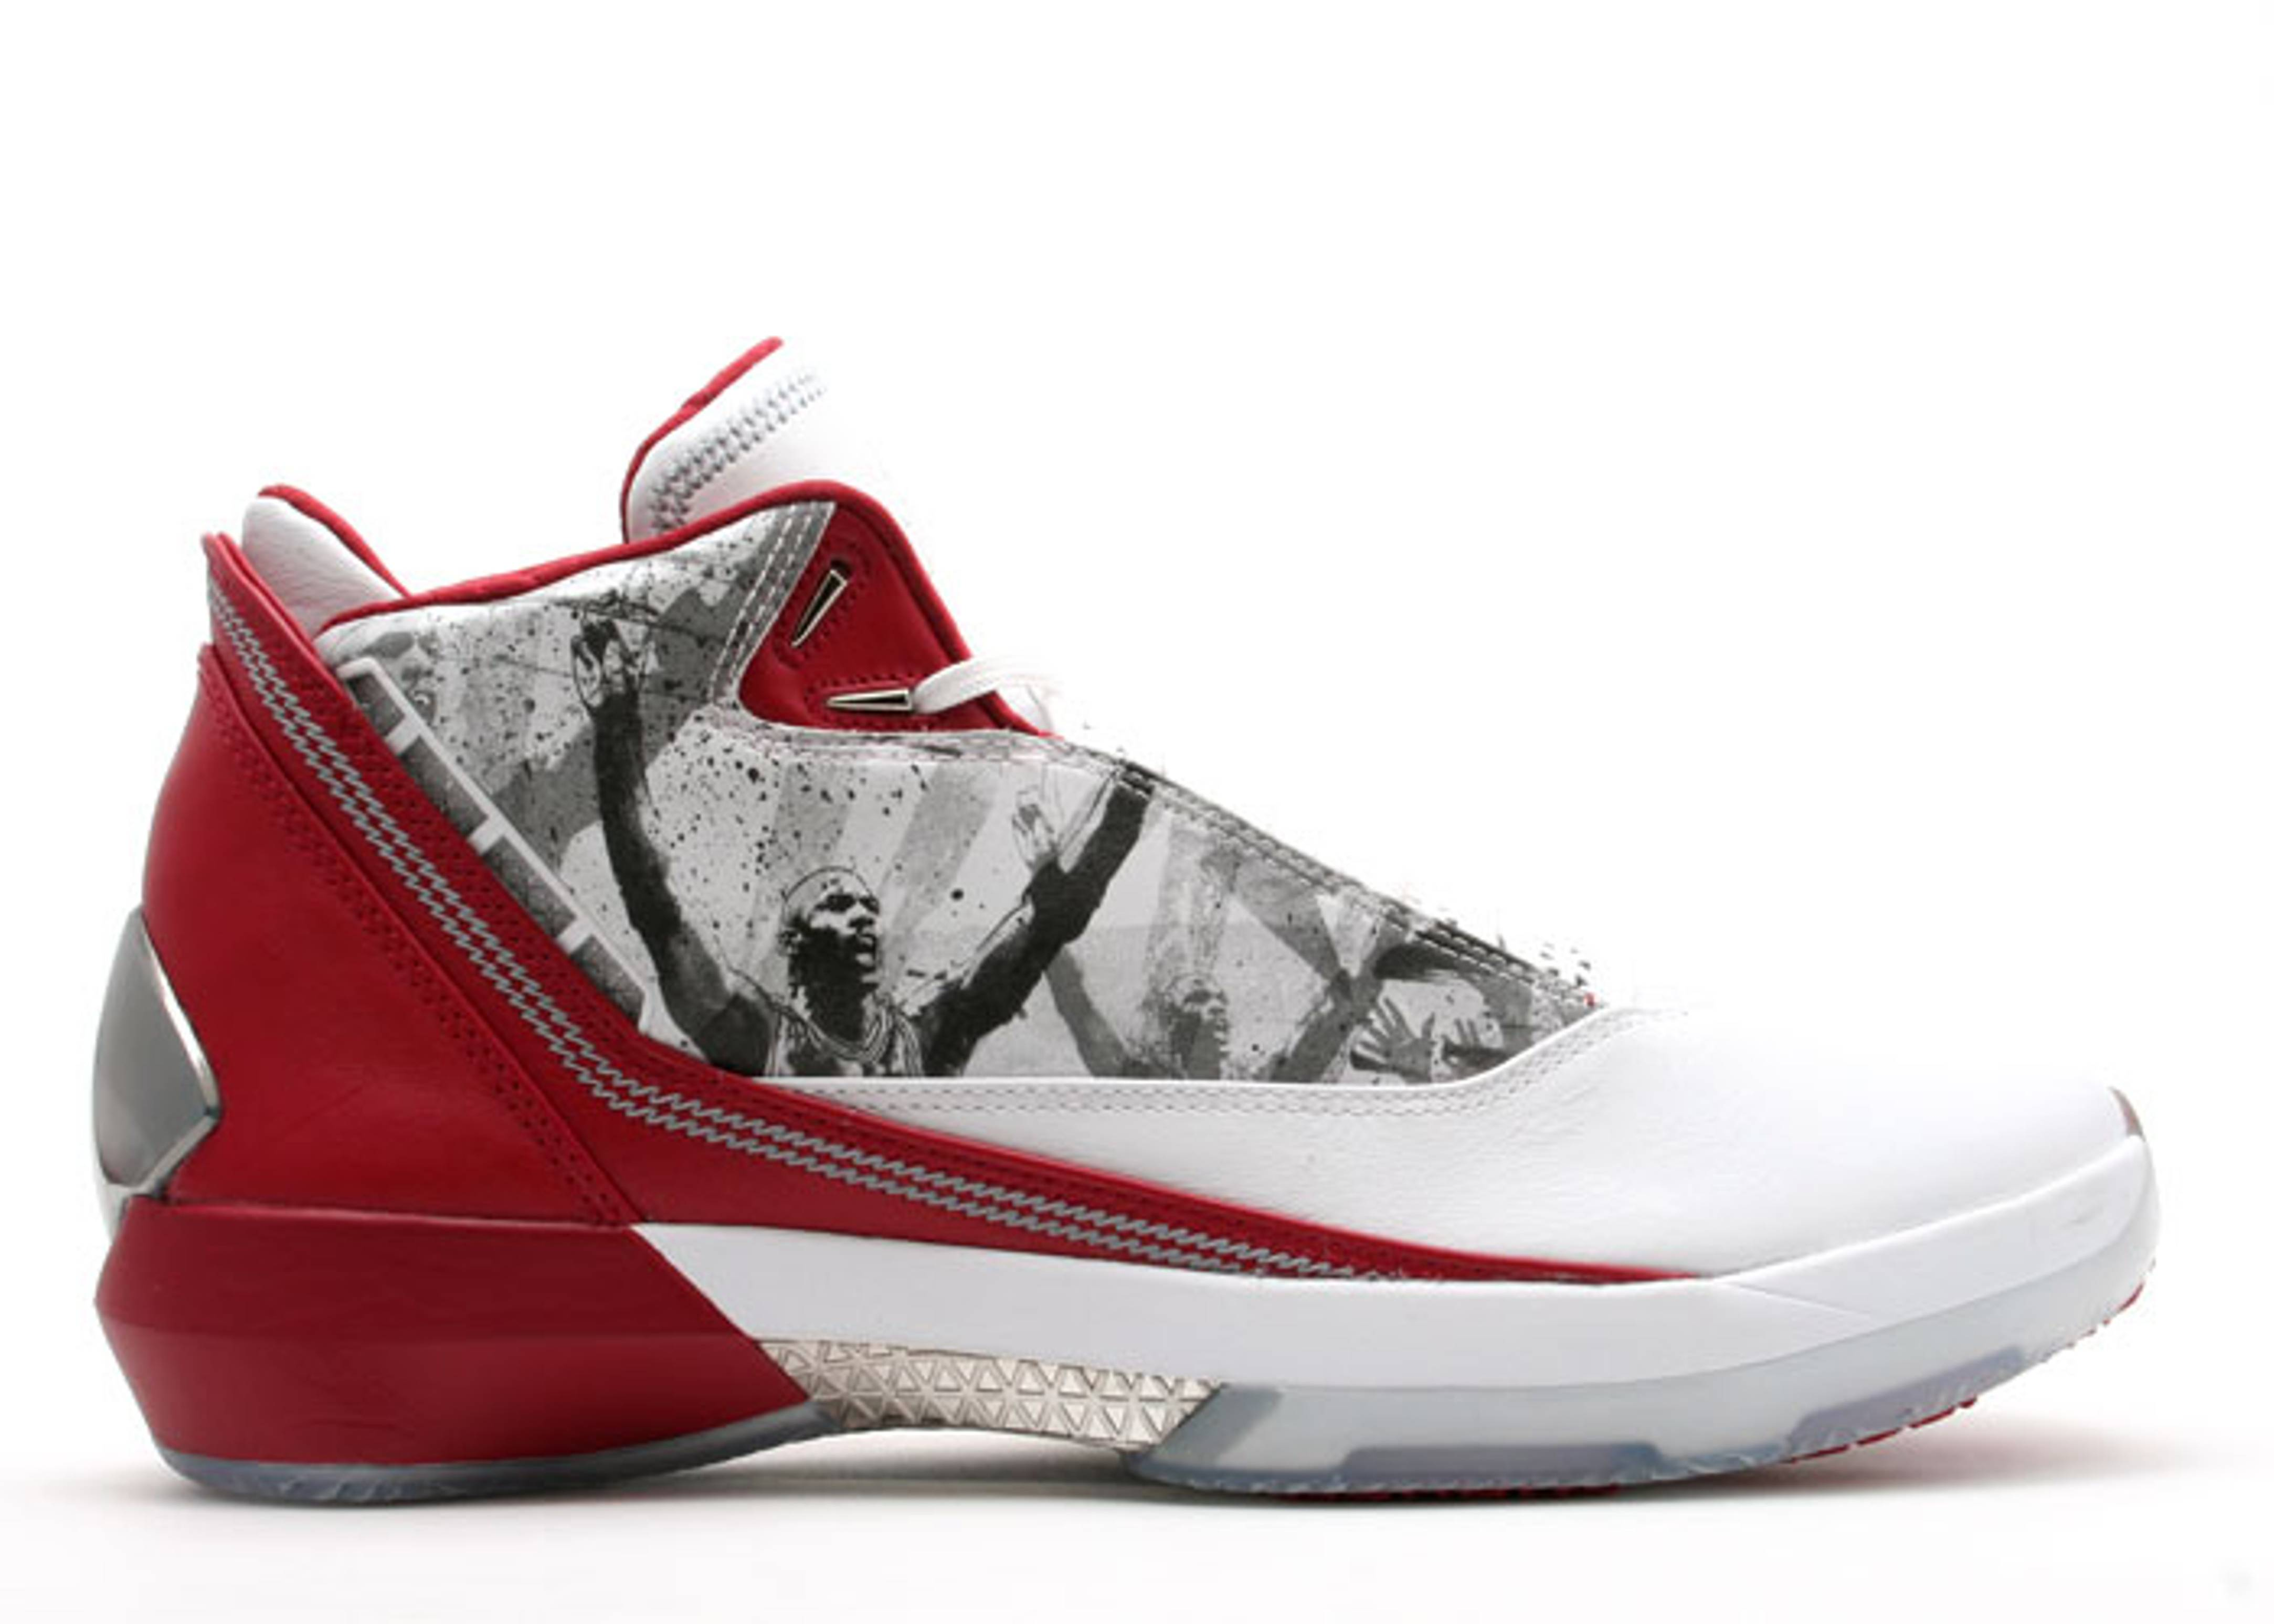 bc6abb6ac8e5 Air Jordan 22 Omega